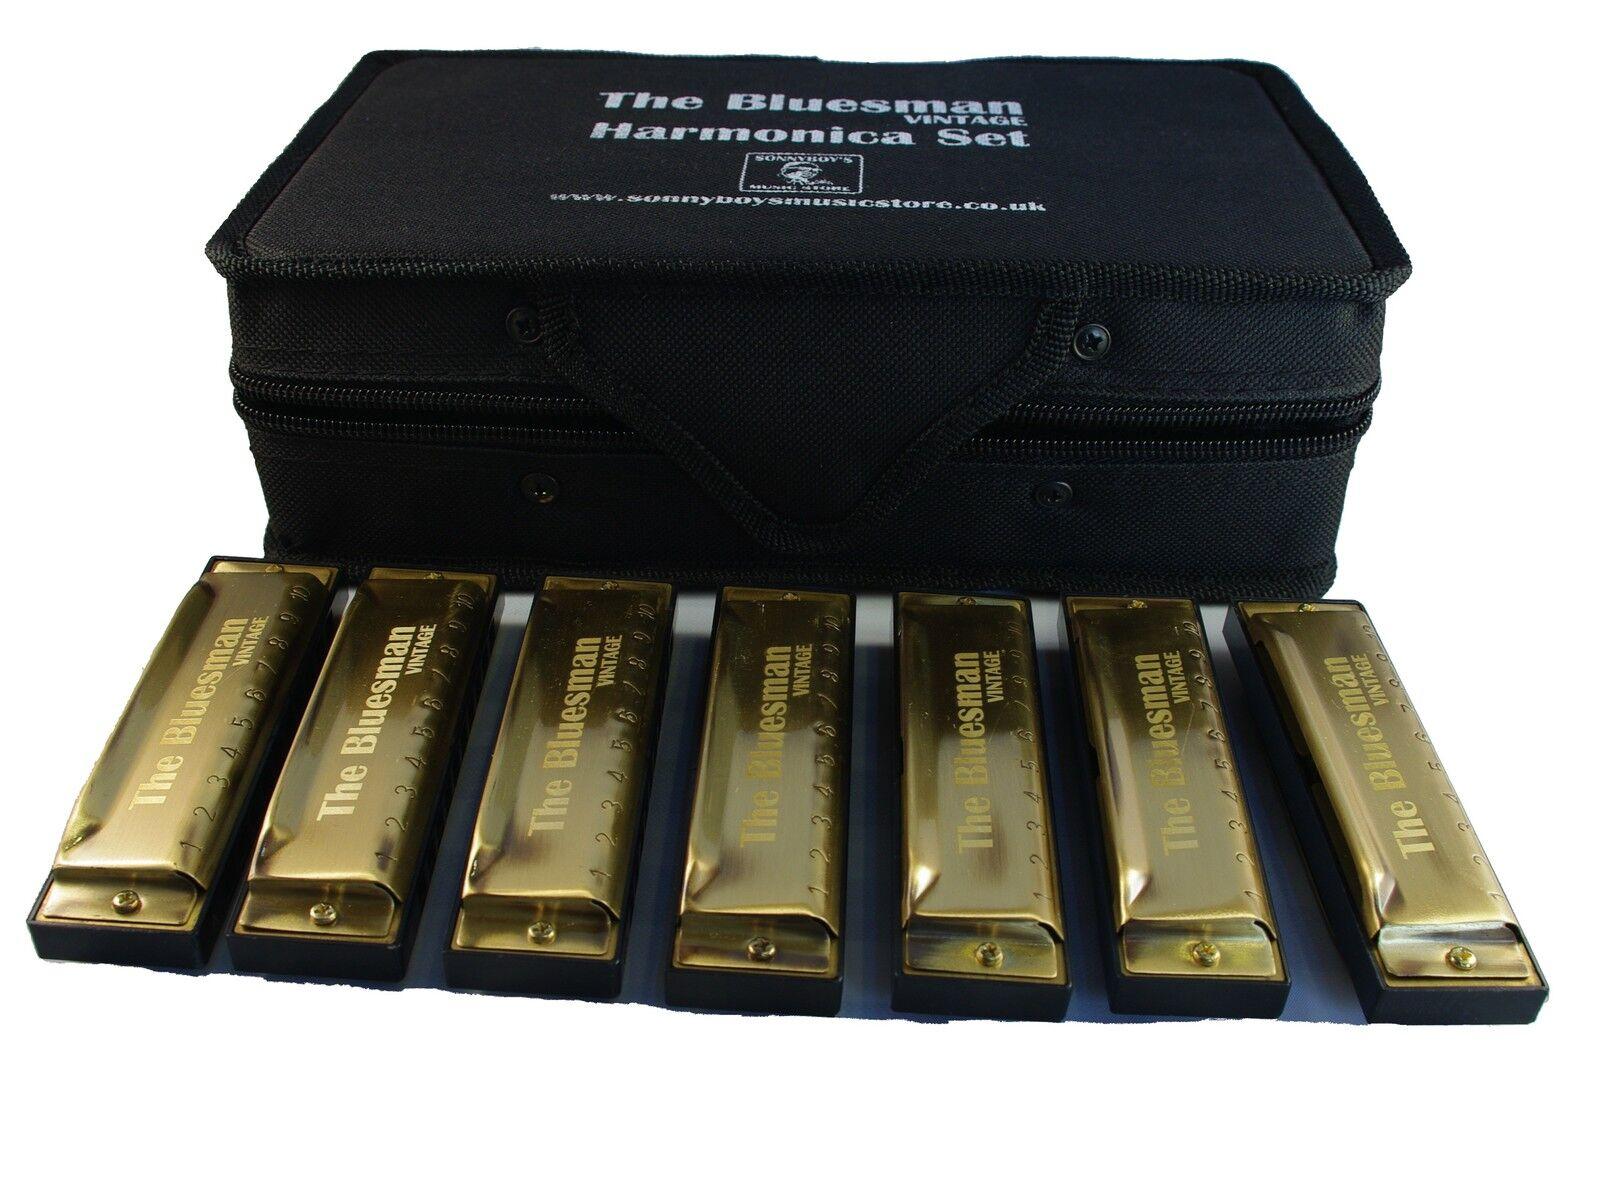 Blausman Vintage Harmonica Boxed sets of 3, 7 or 12 harmonicas